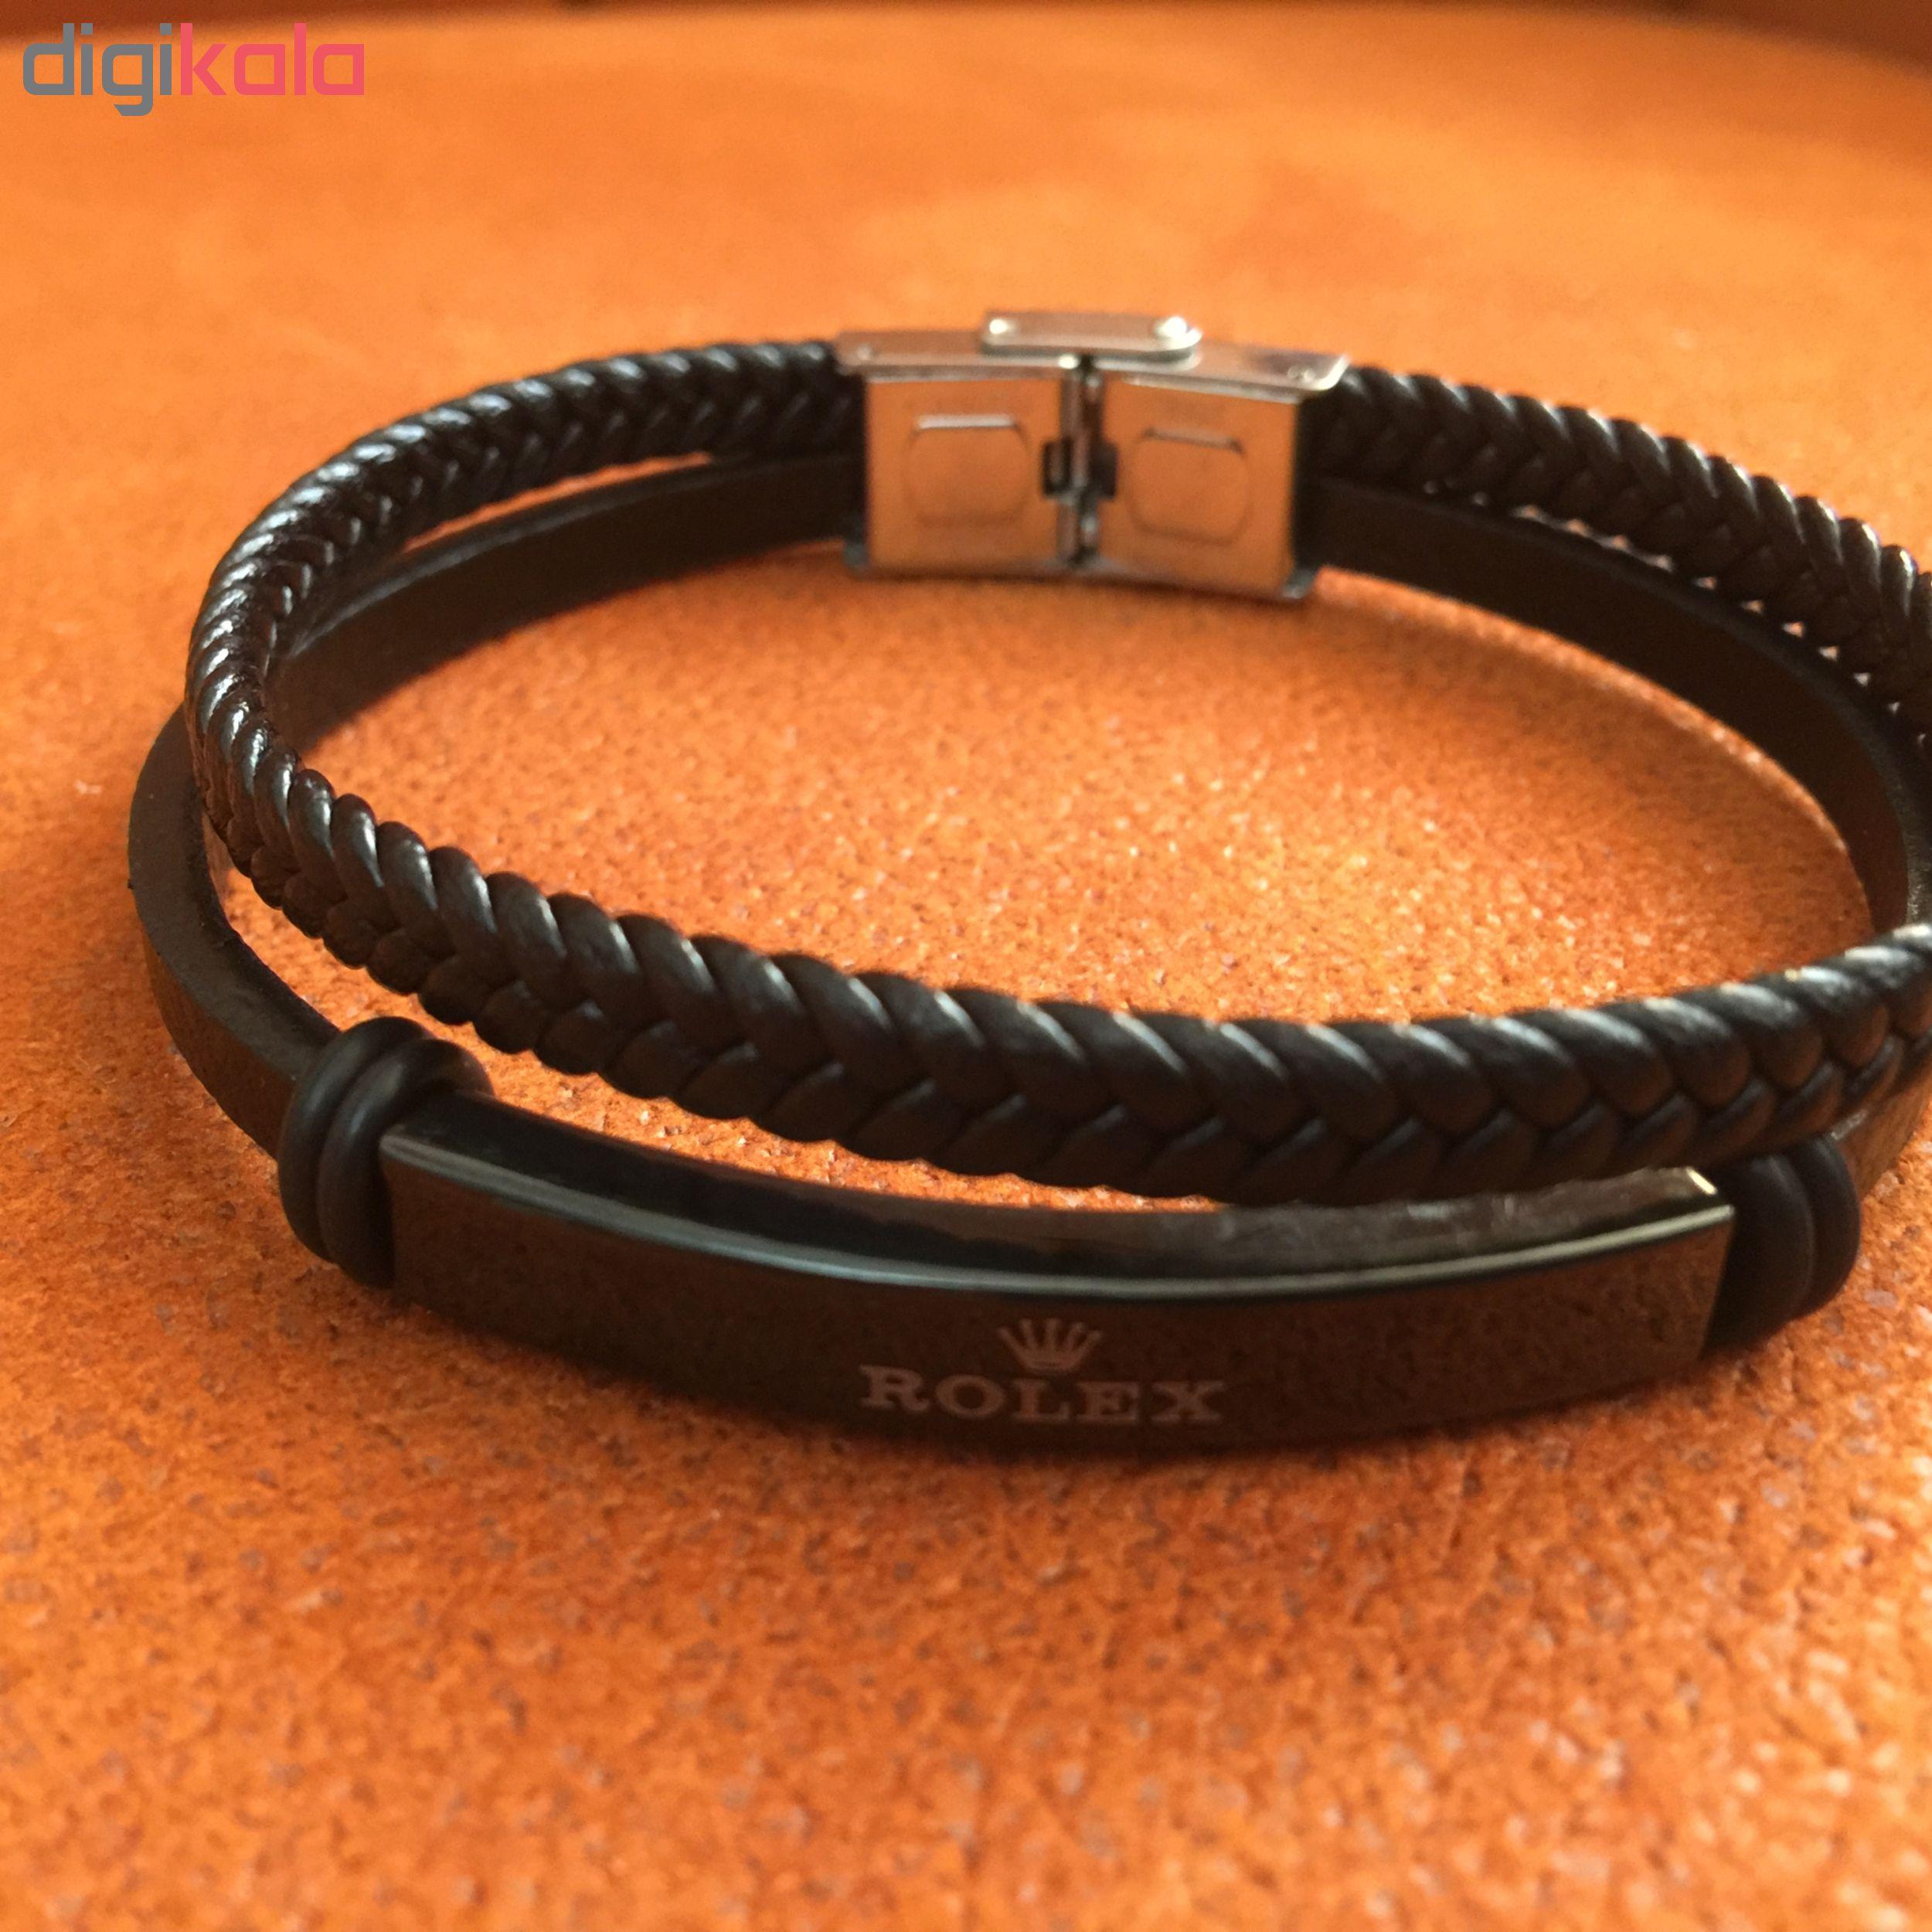 دستبند مردانه کد 228                     غیر اصل